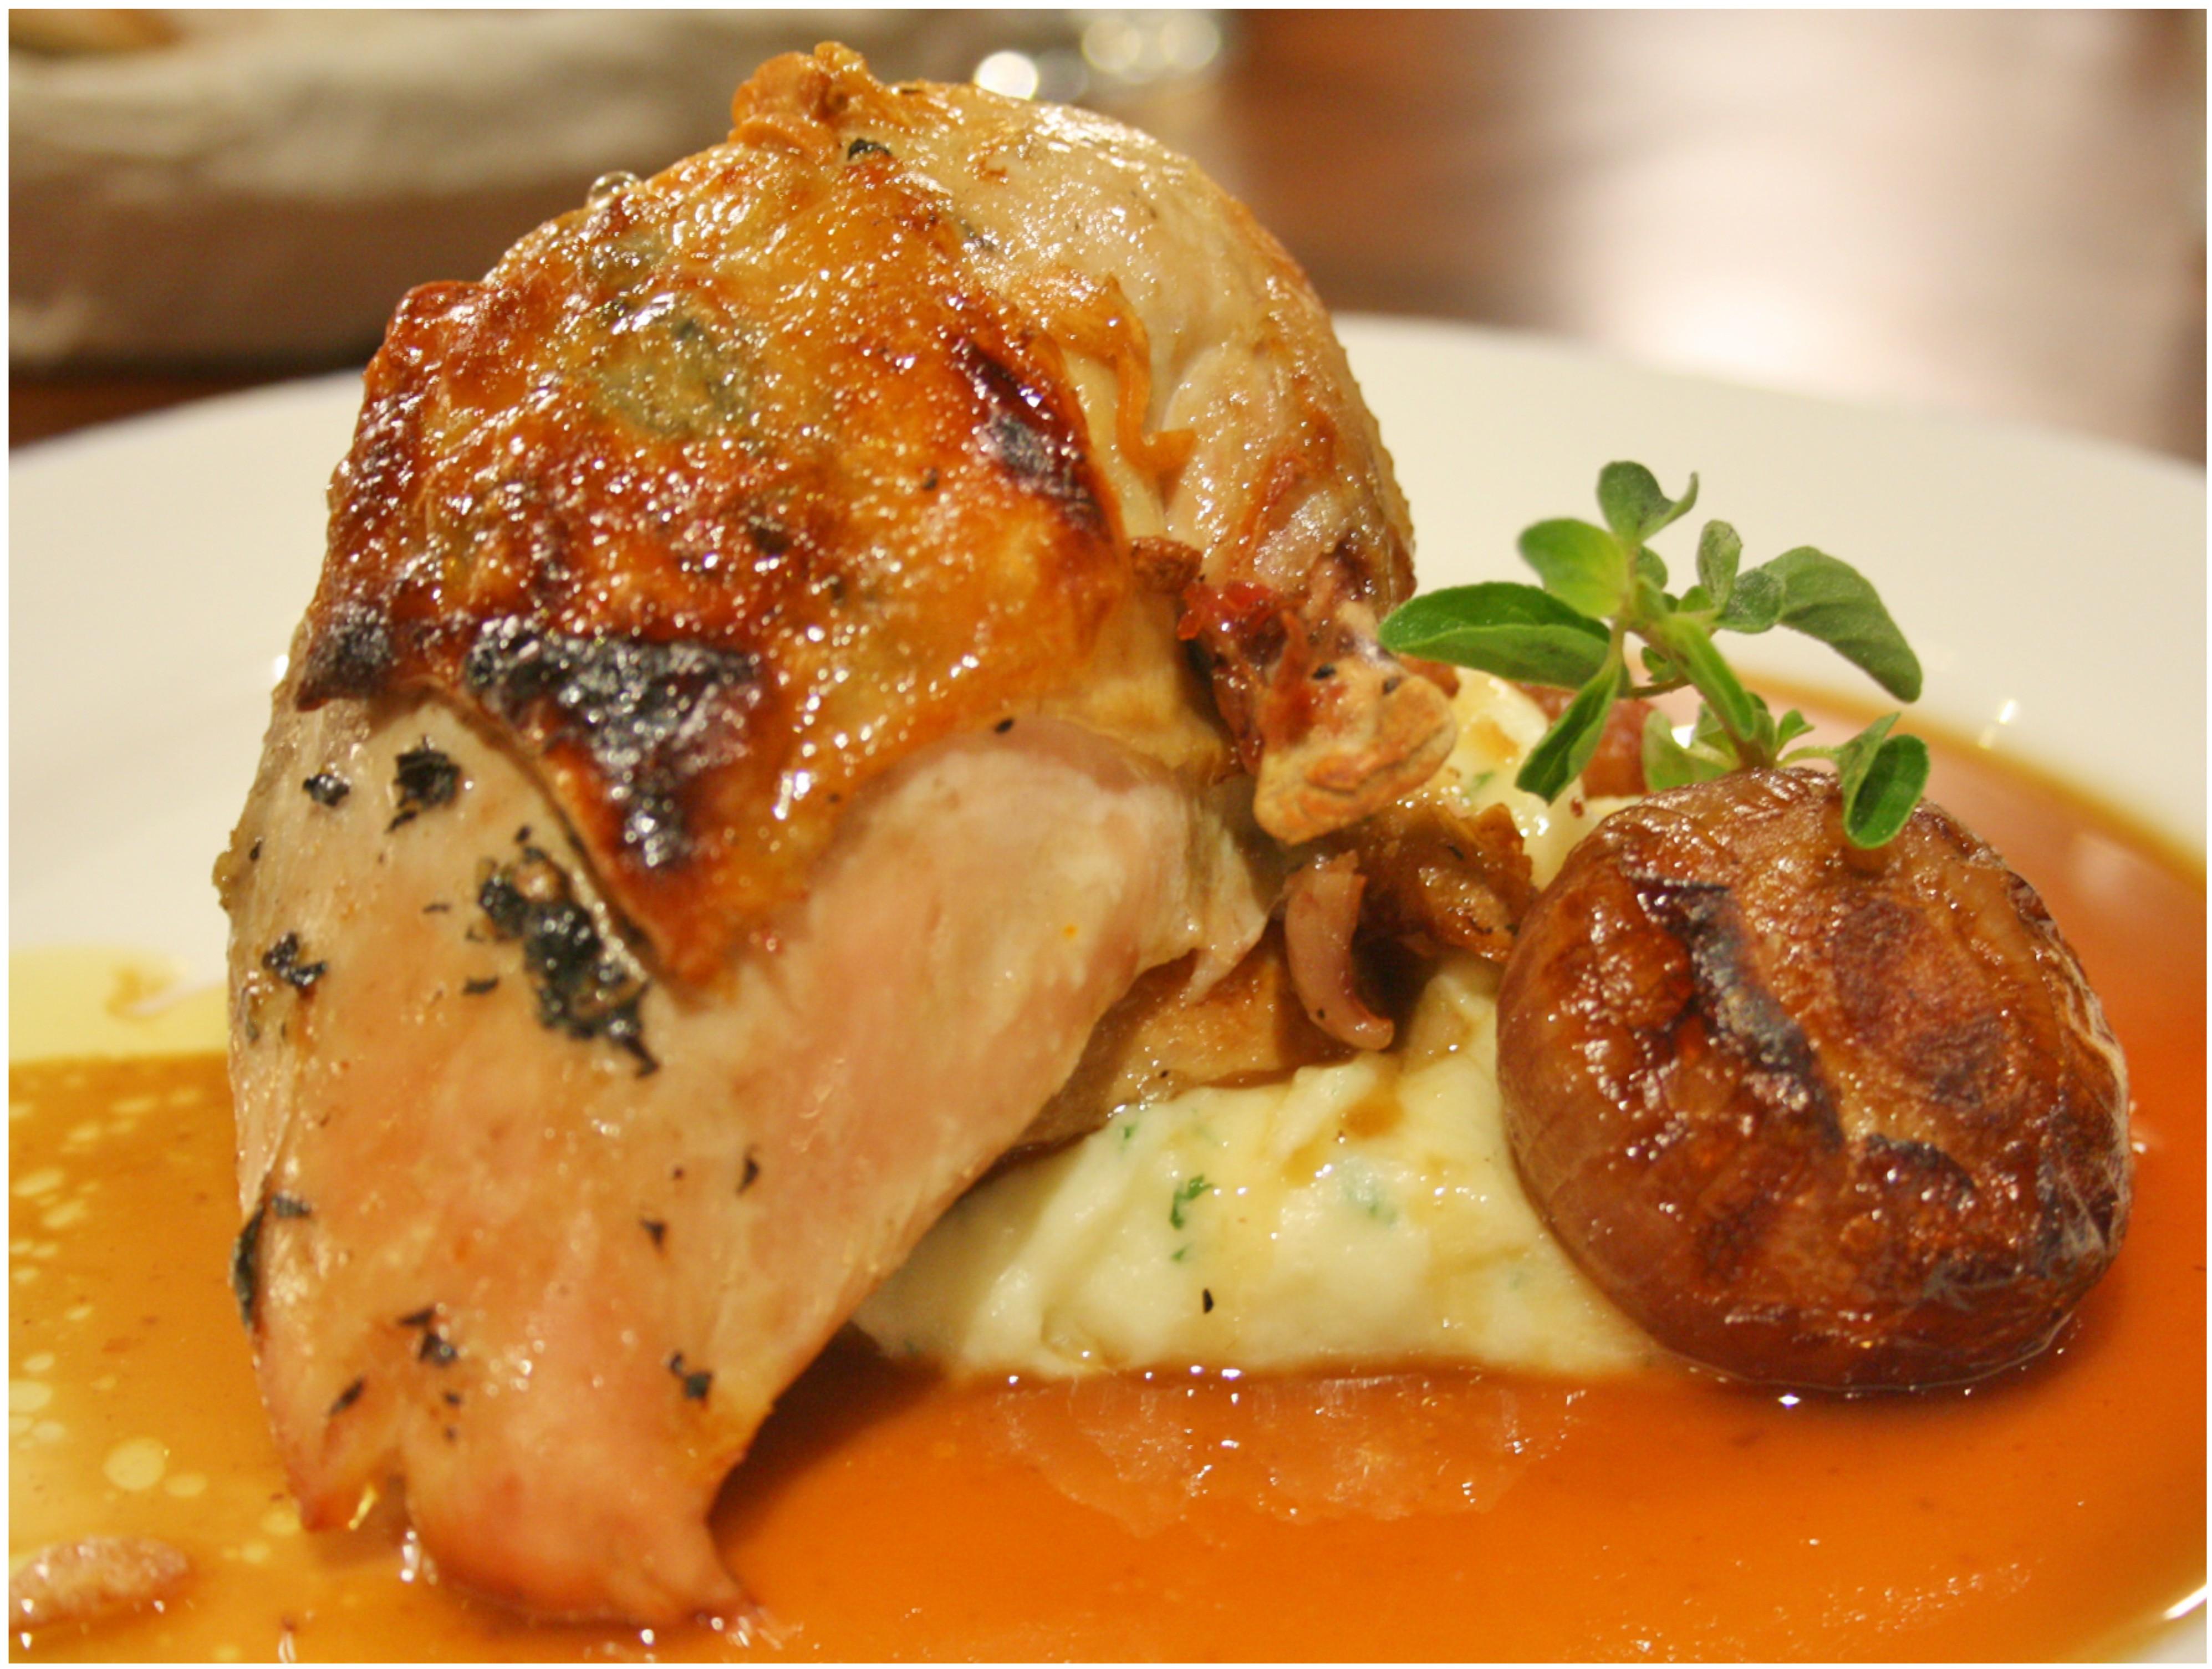 indigo-deli-roasted-chicken-bellydriven